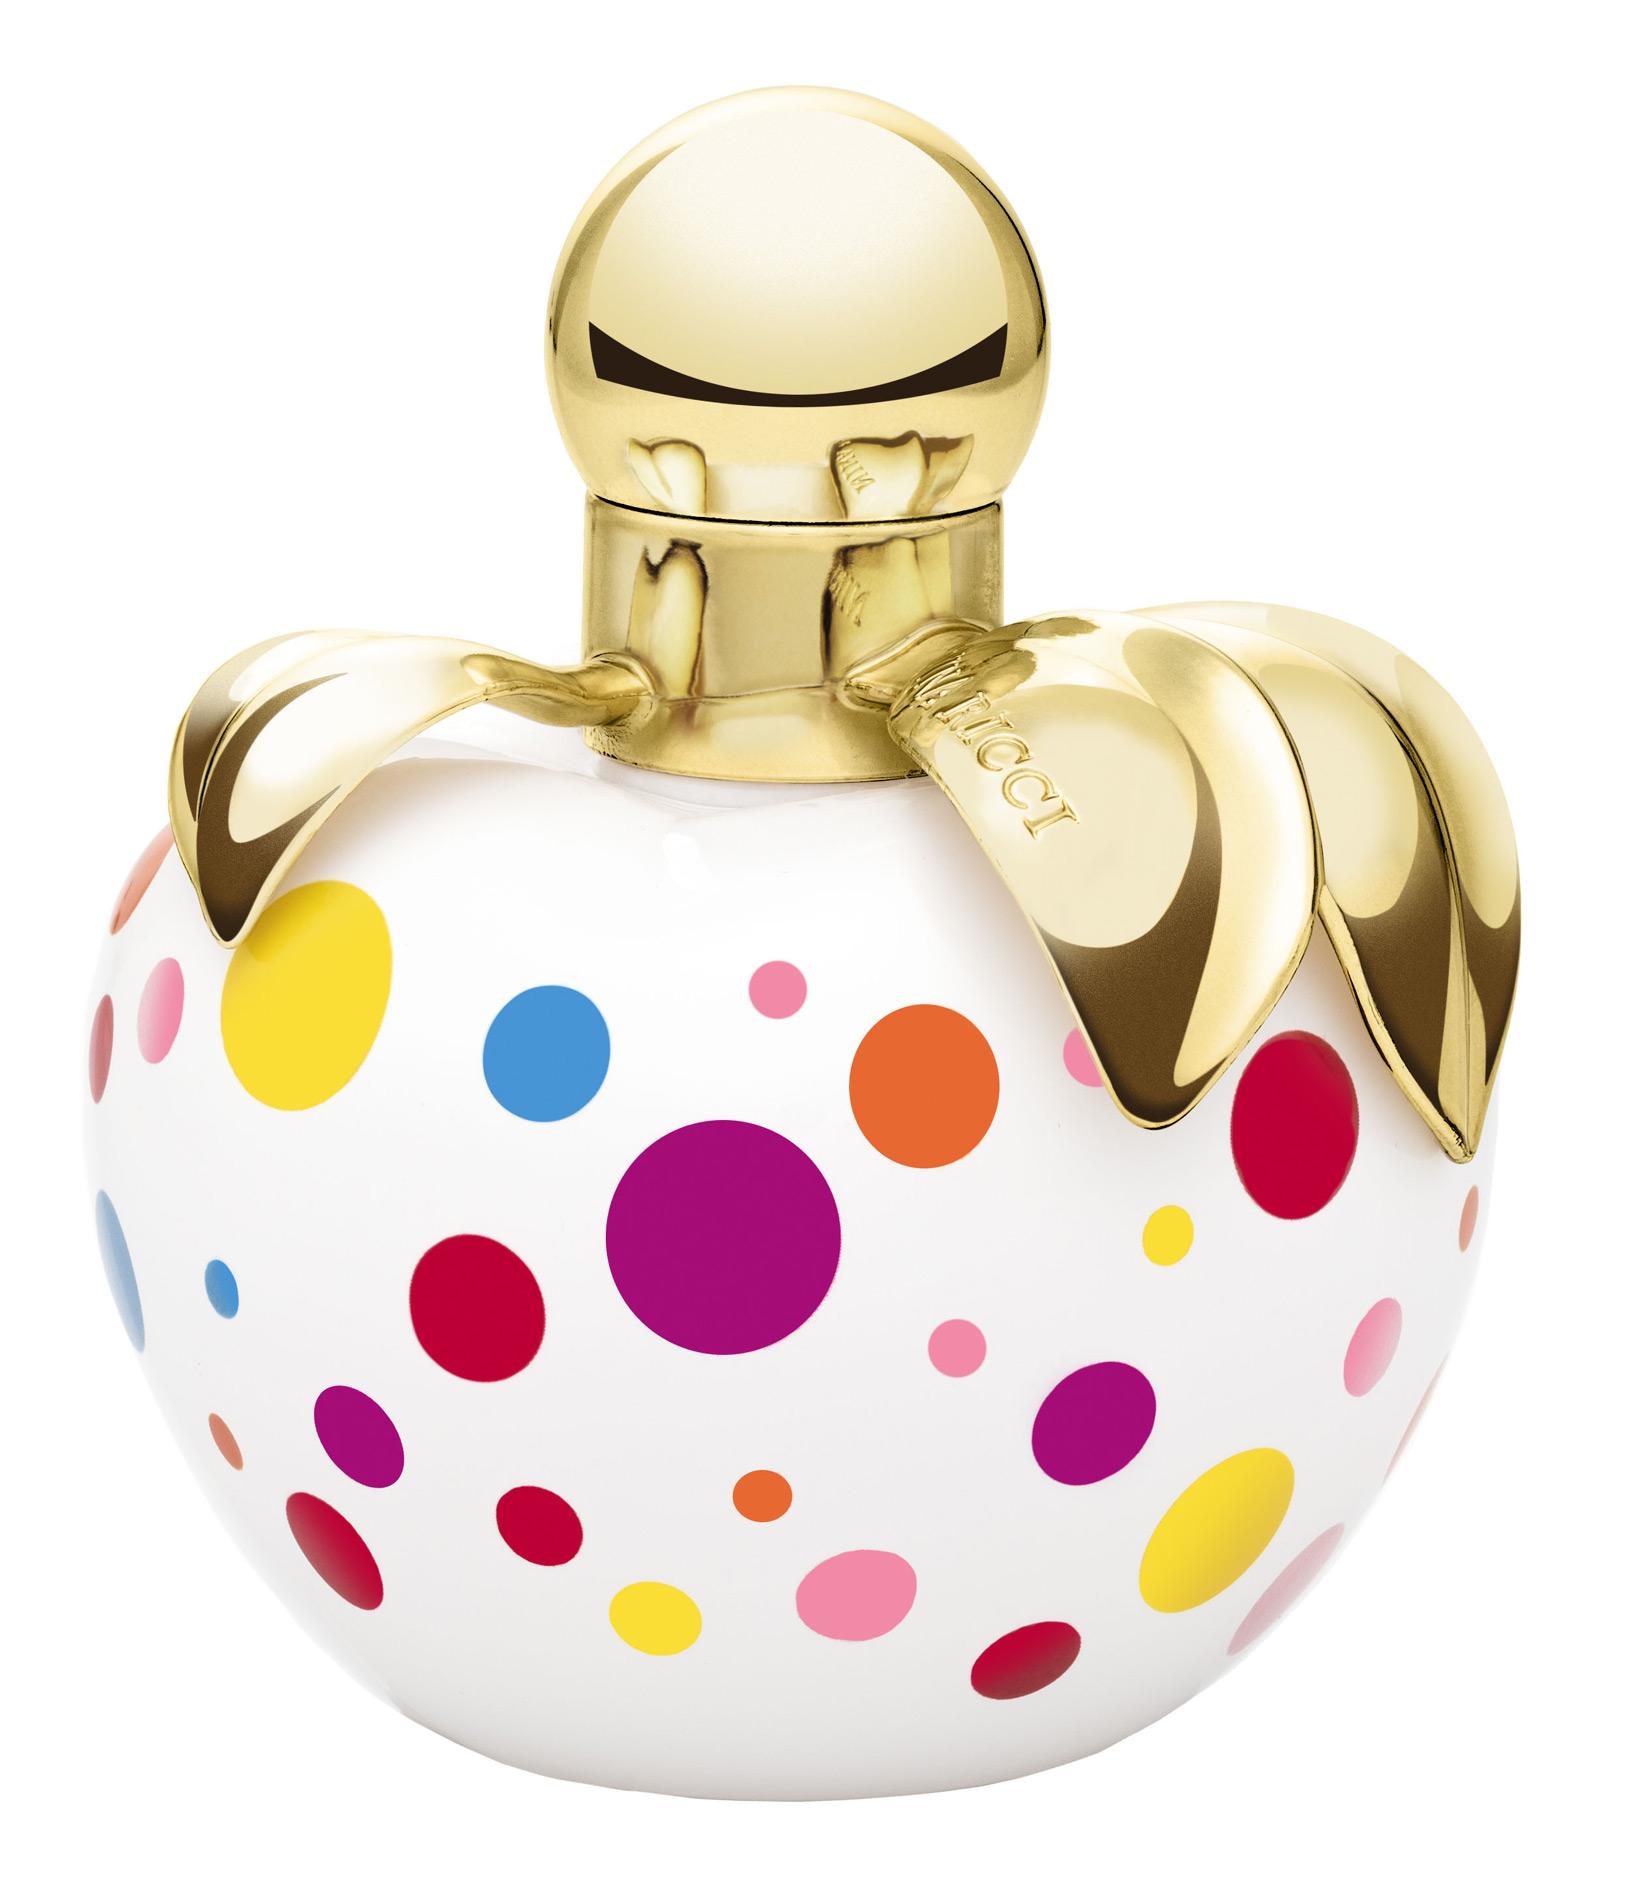 Nina Pop Nina Ricci perfume - a new fragrance for women 2015